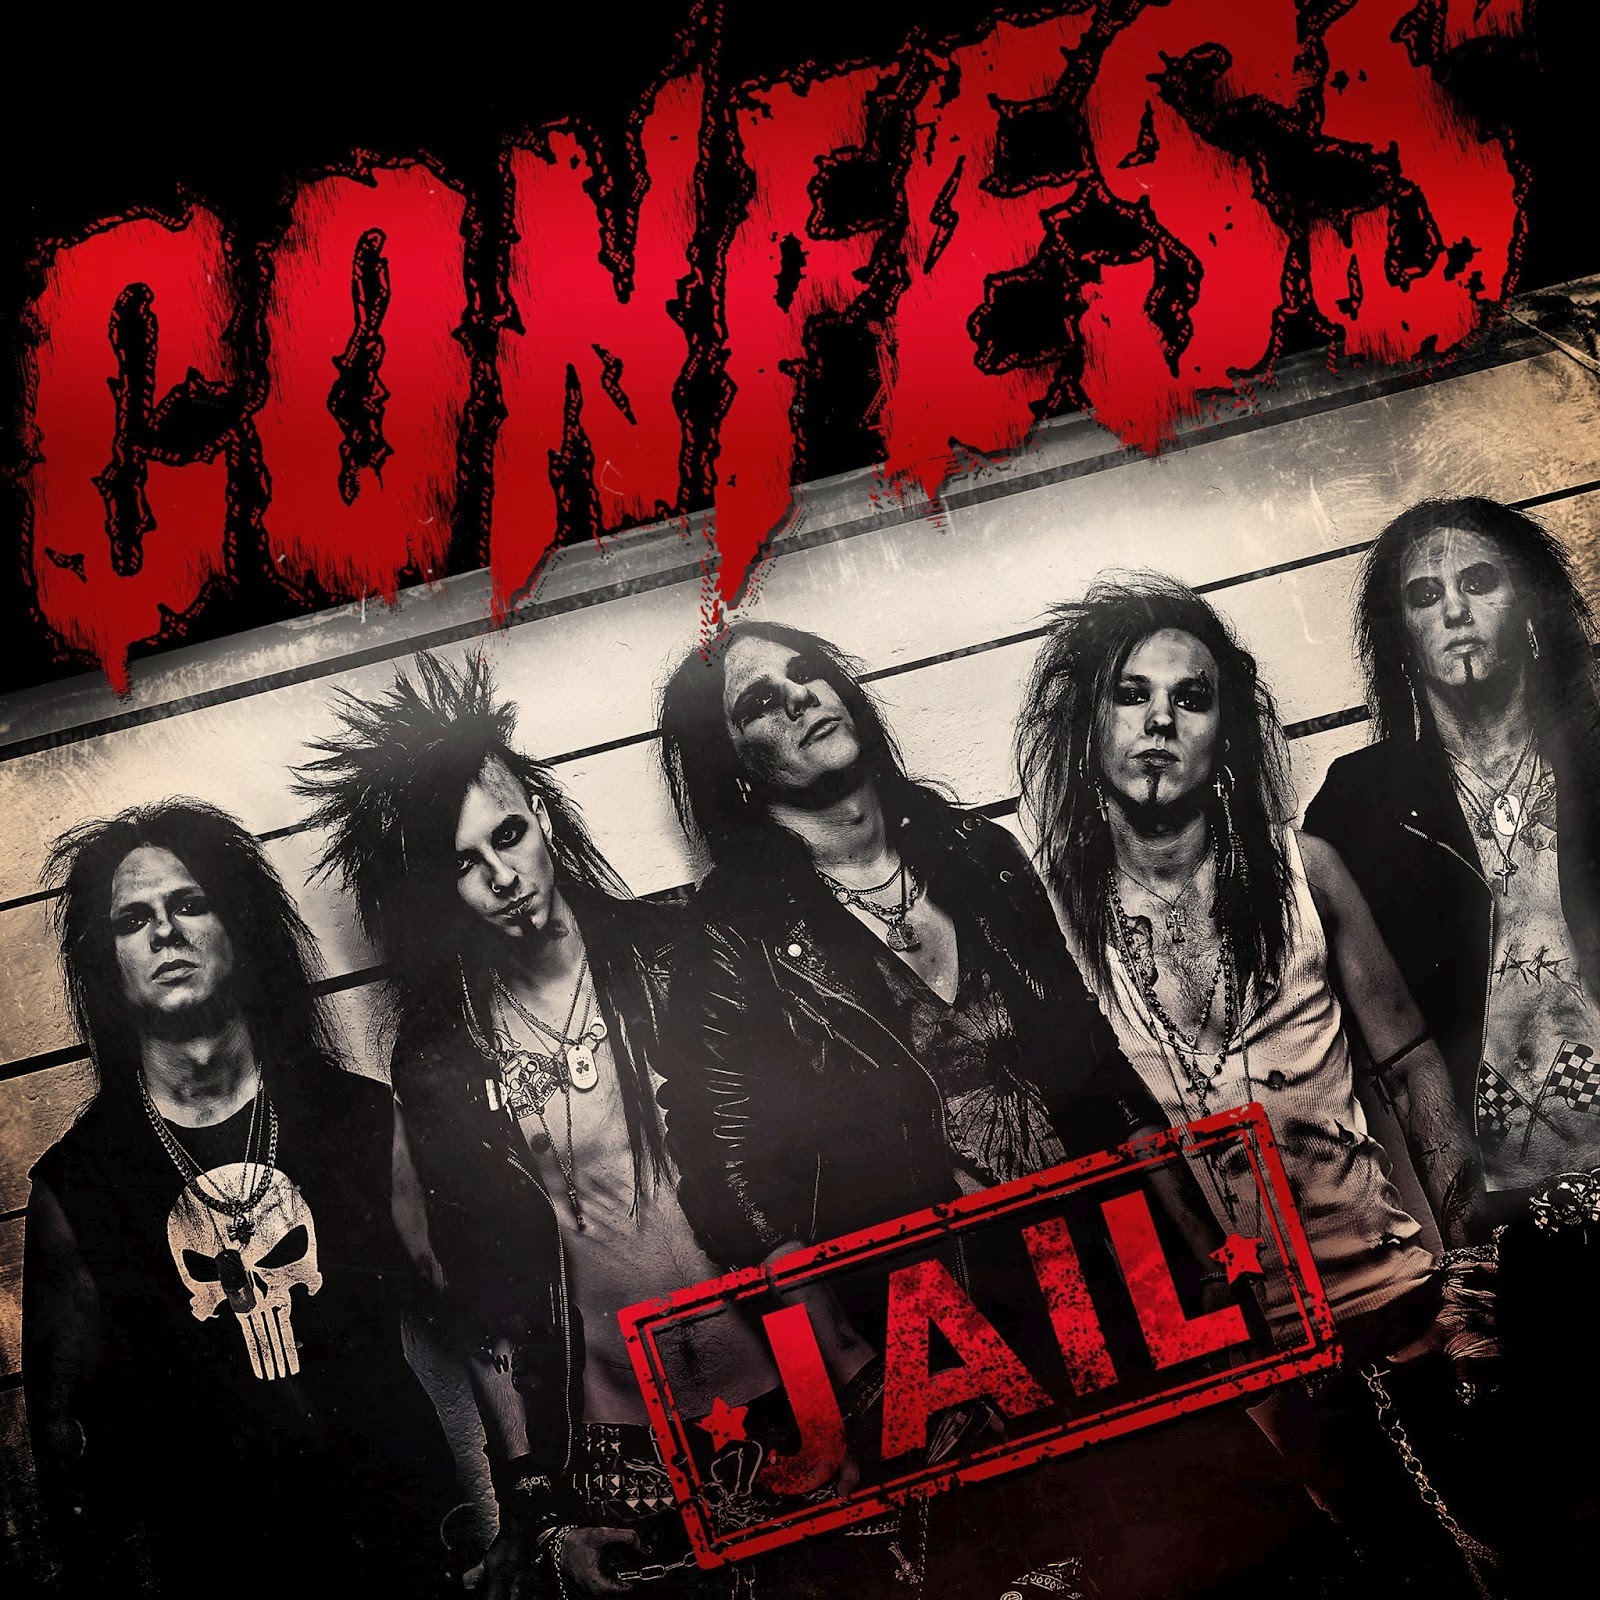 http://rock-and-metal-4-you.blogspot.de/2014/04/cd-review-confess-jail.html